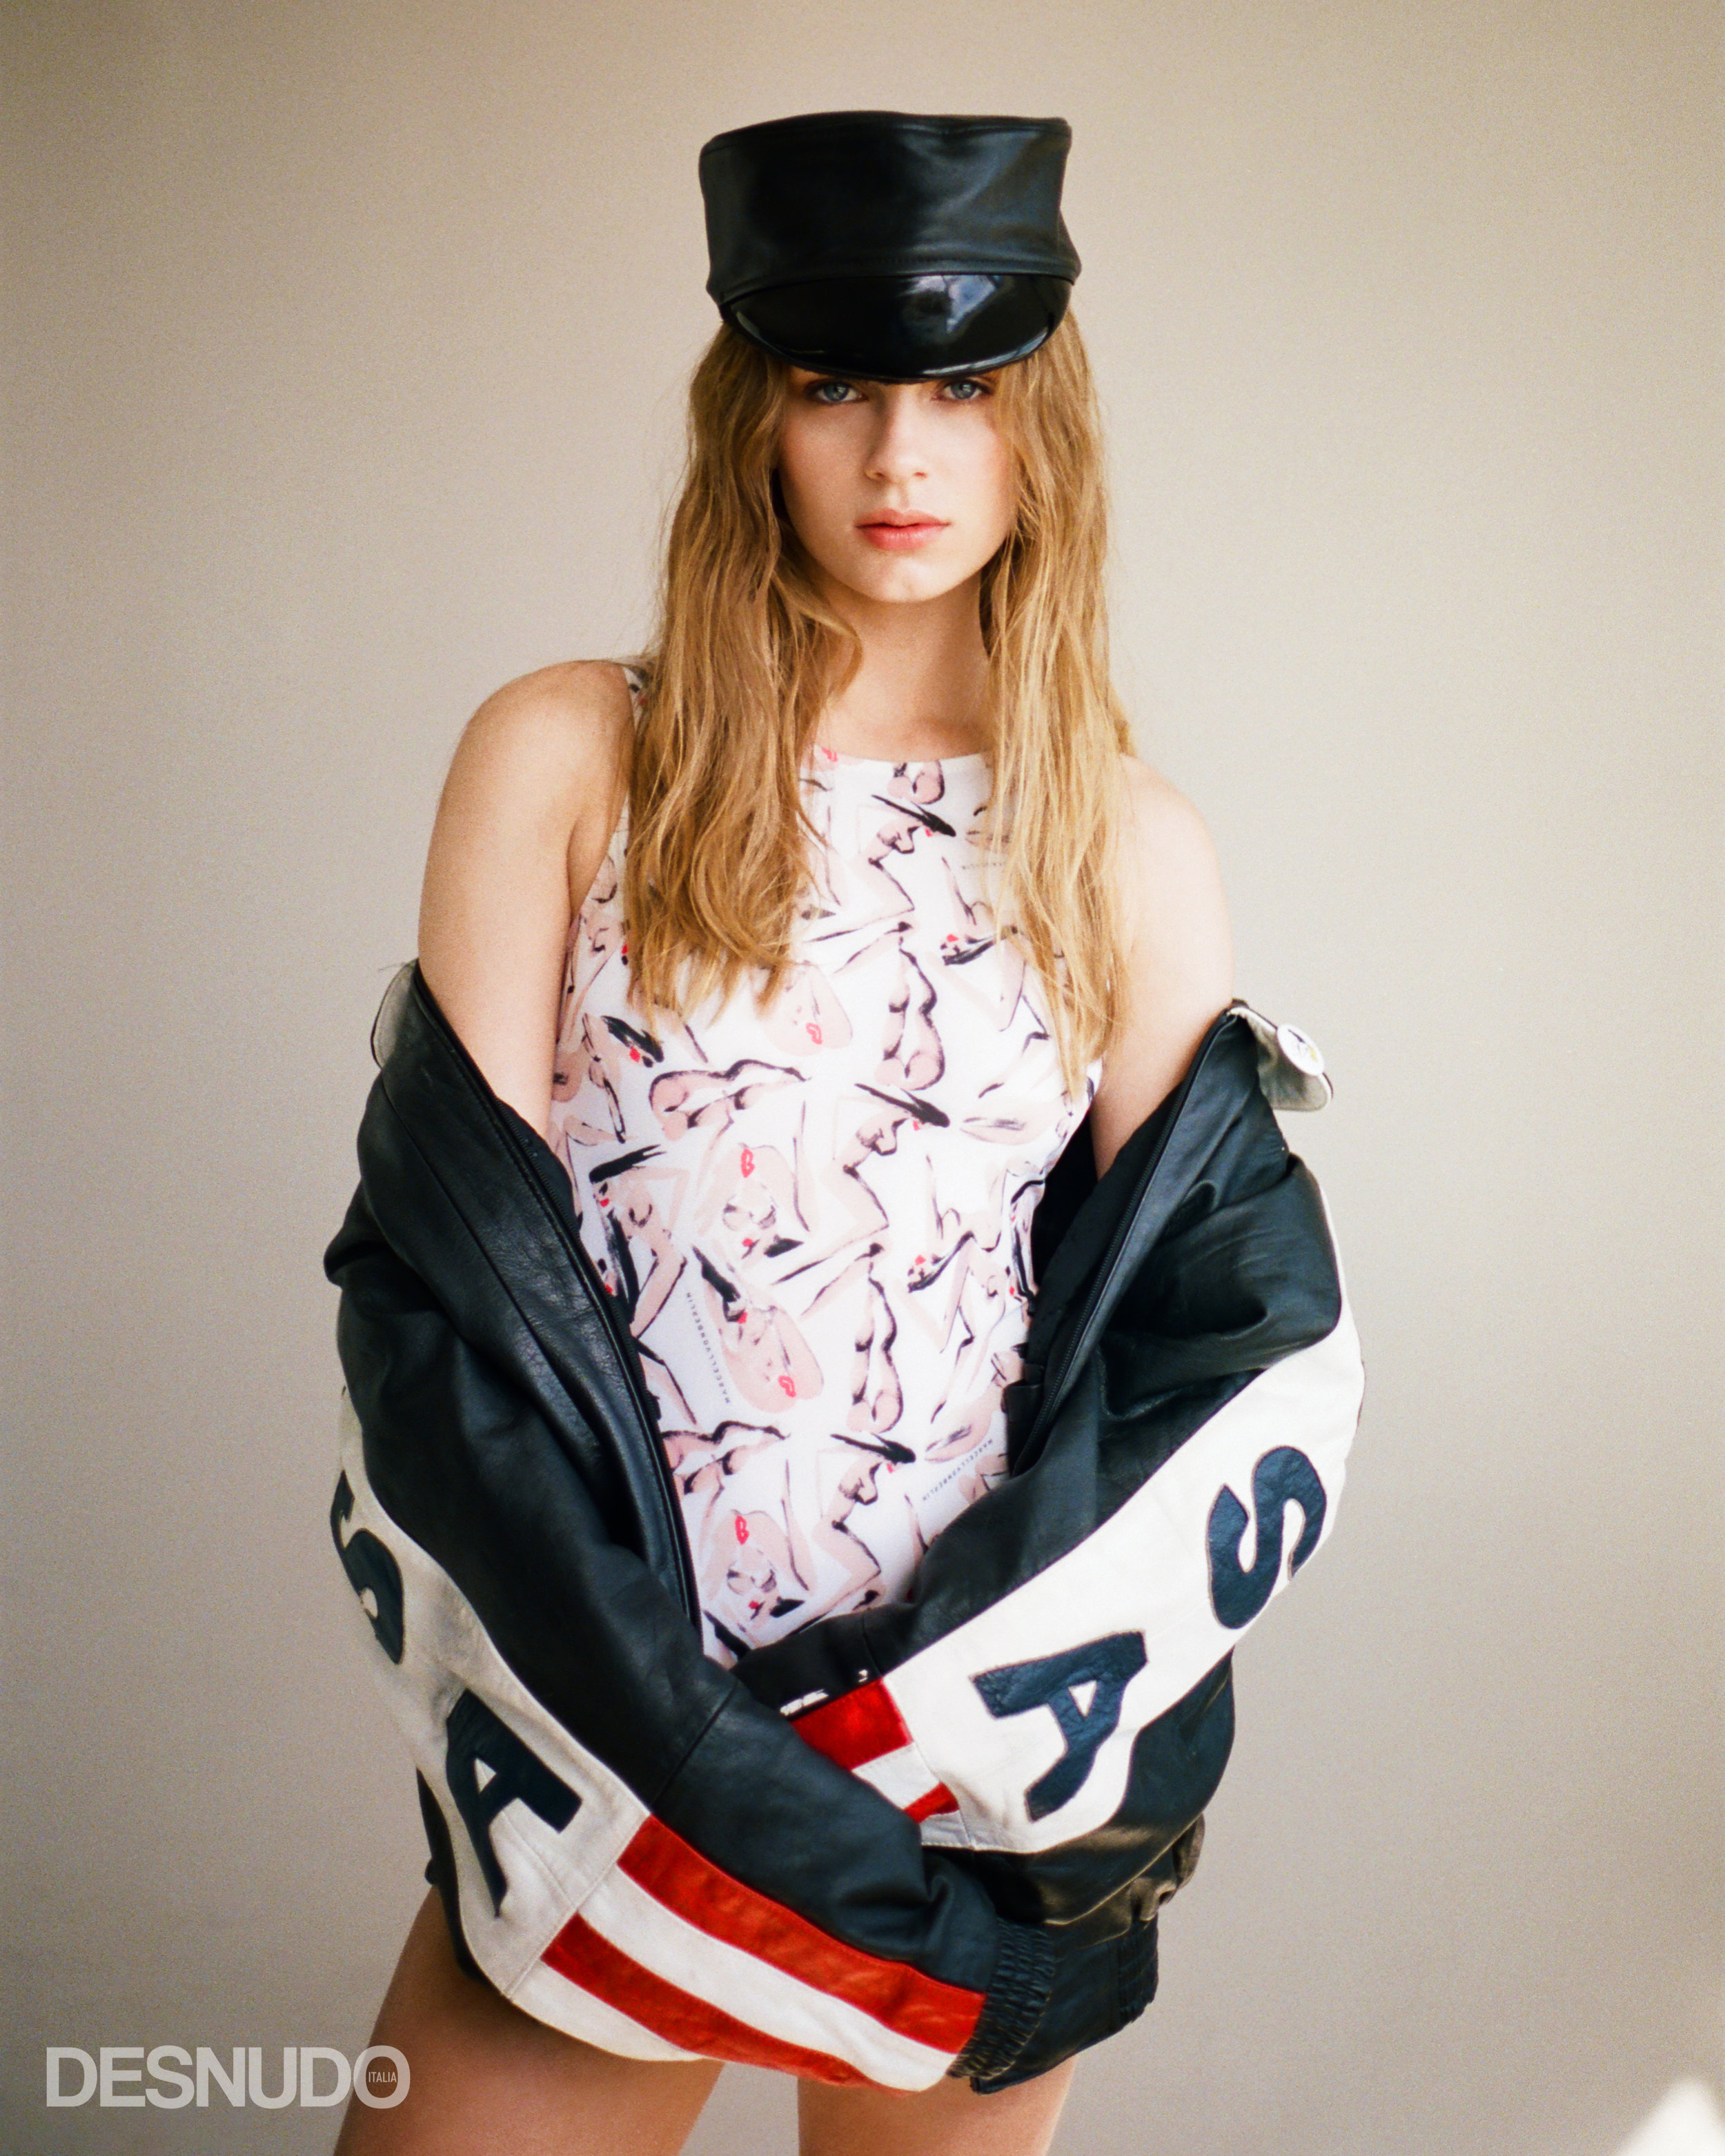 red lips bodysuit  MARCELL VON BERLIN , USA leather jacket  VINTAGE , black leather hat  SAINT GERMAINE